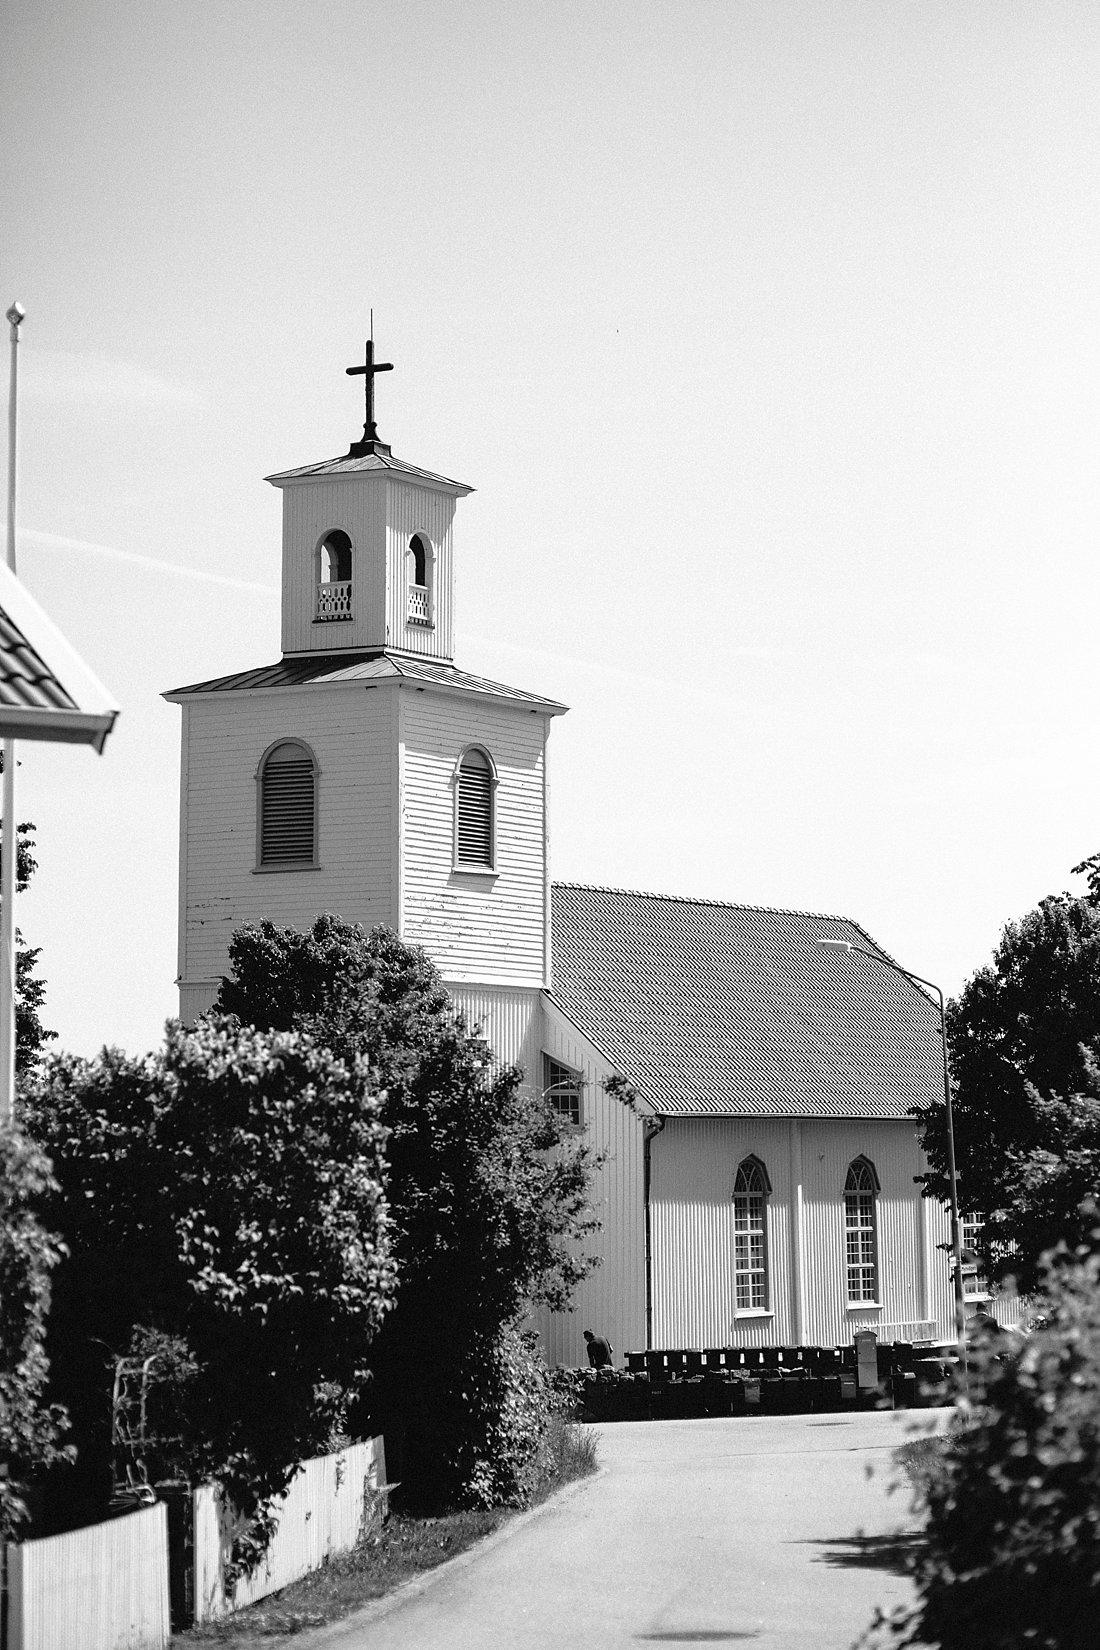 Malmöns kyrka